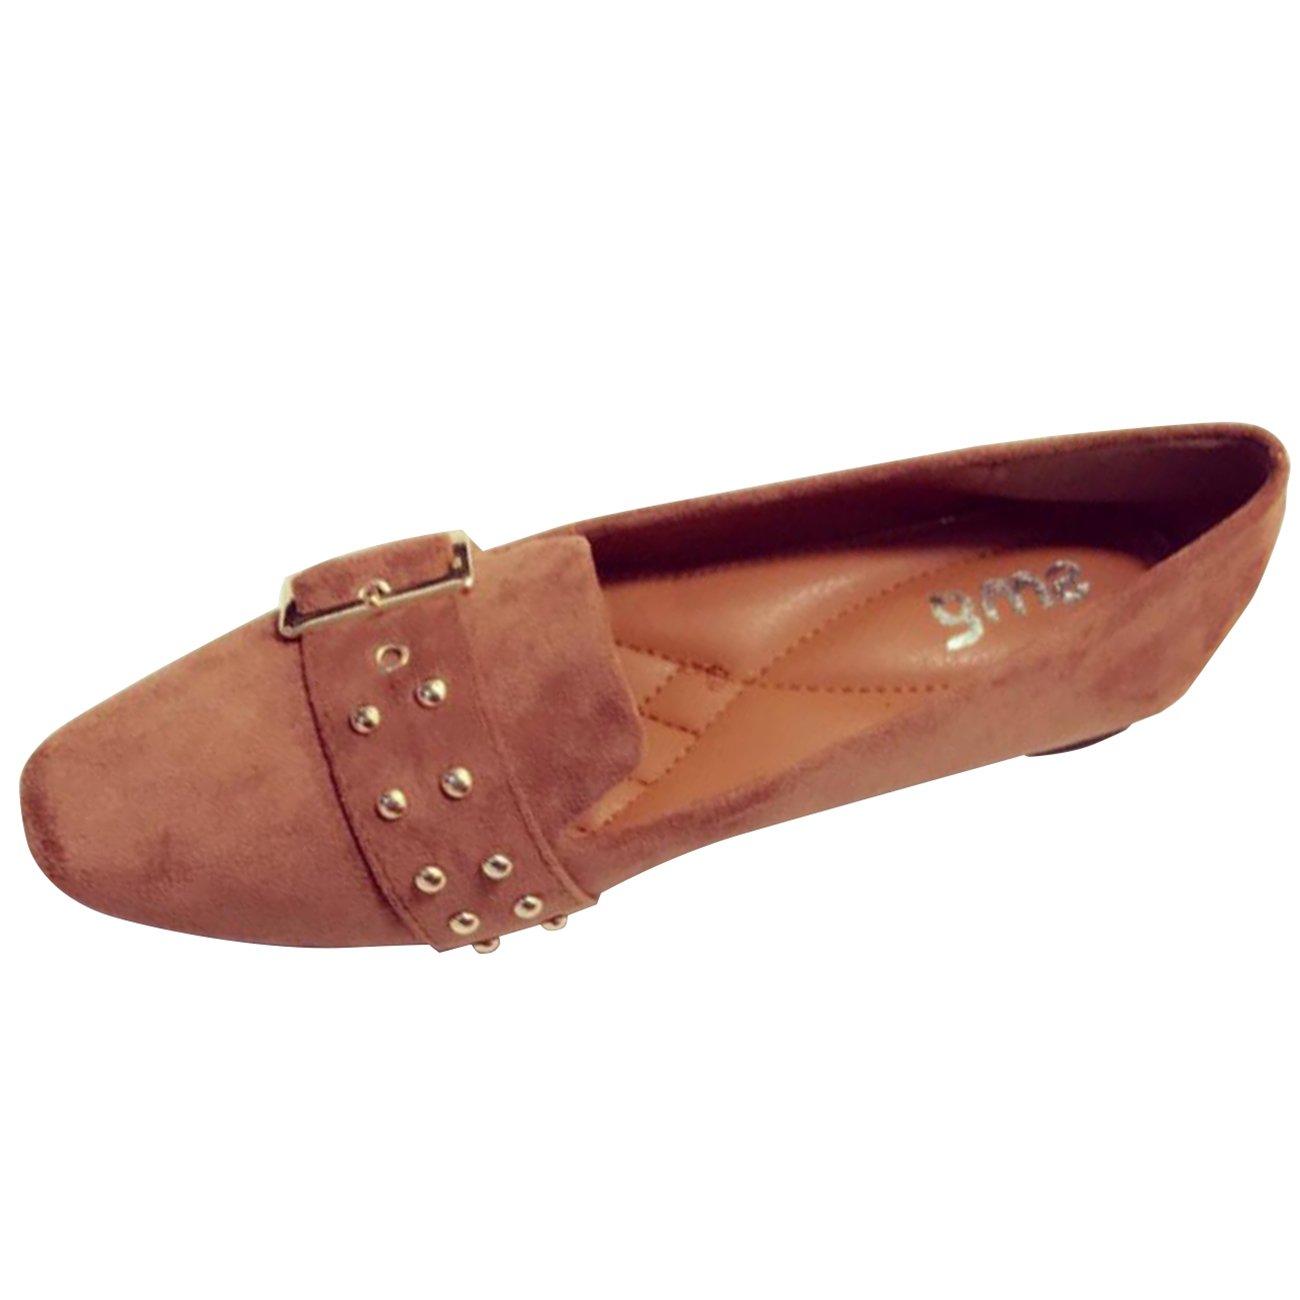 Mashiaoyi Womens Square-Toe British-Style Flat Slip-on Buckle Rivet Loafers